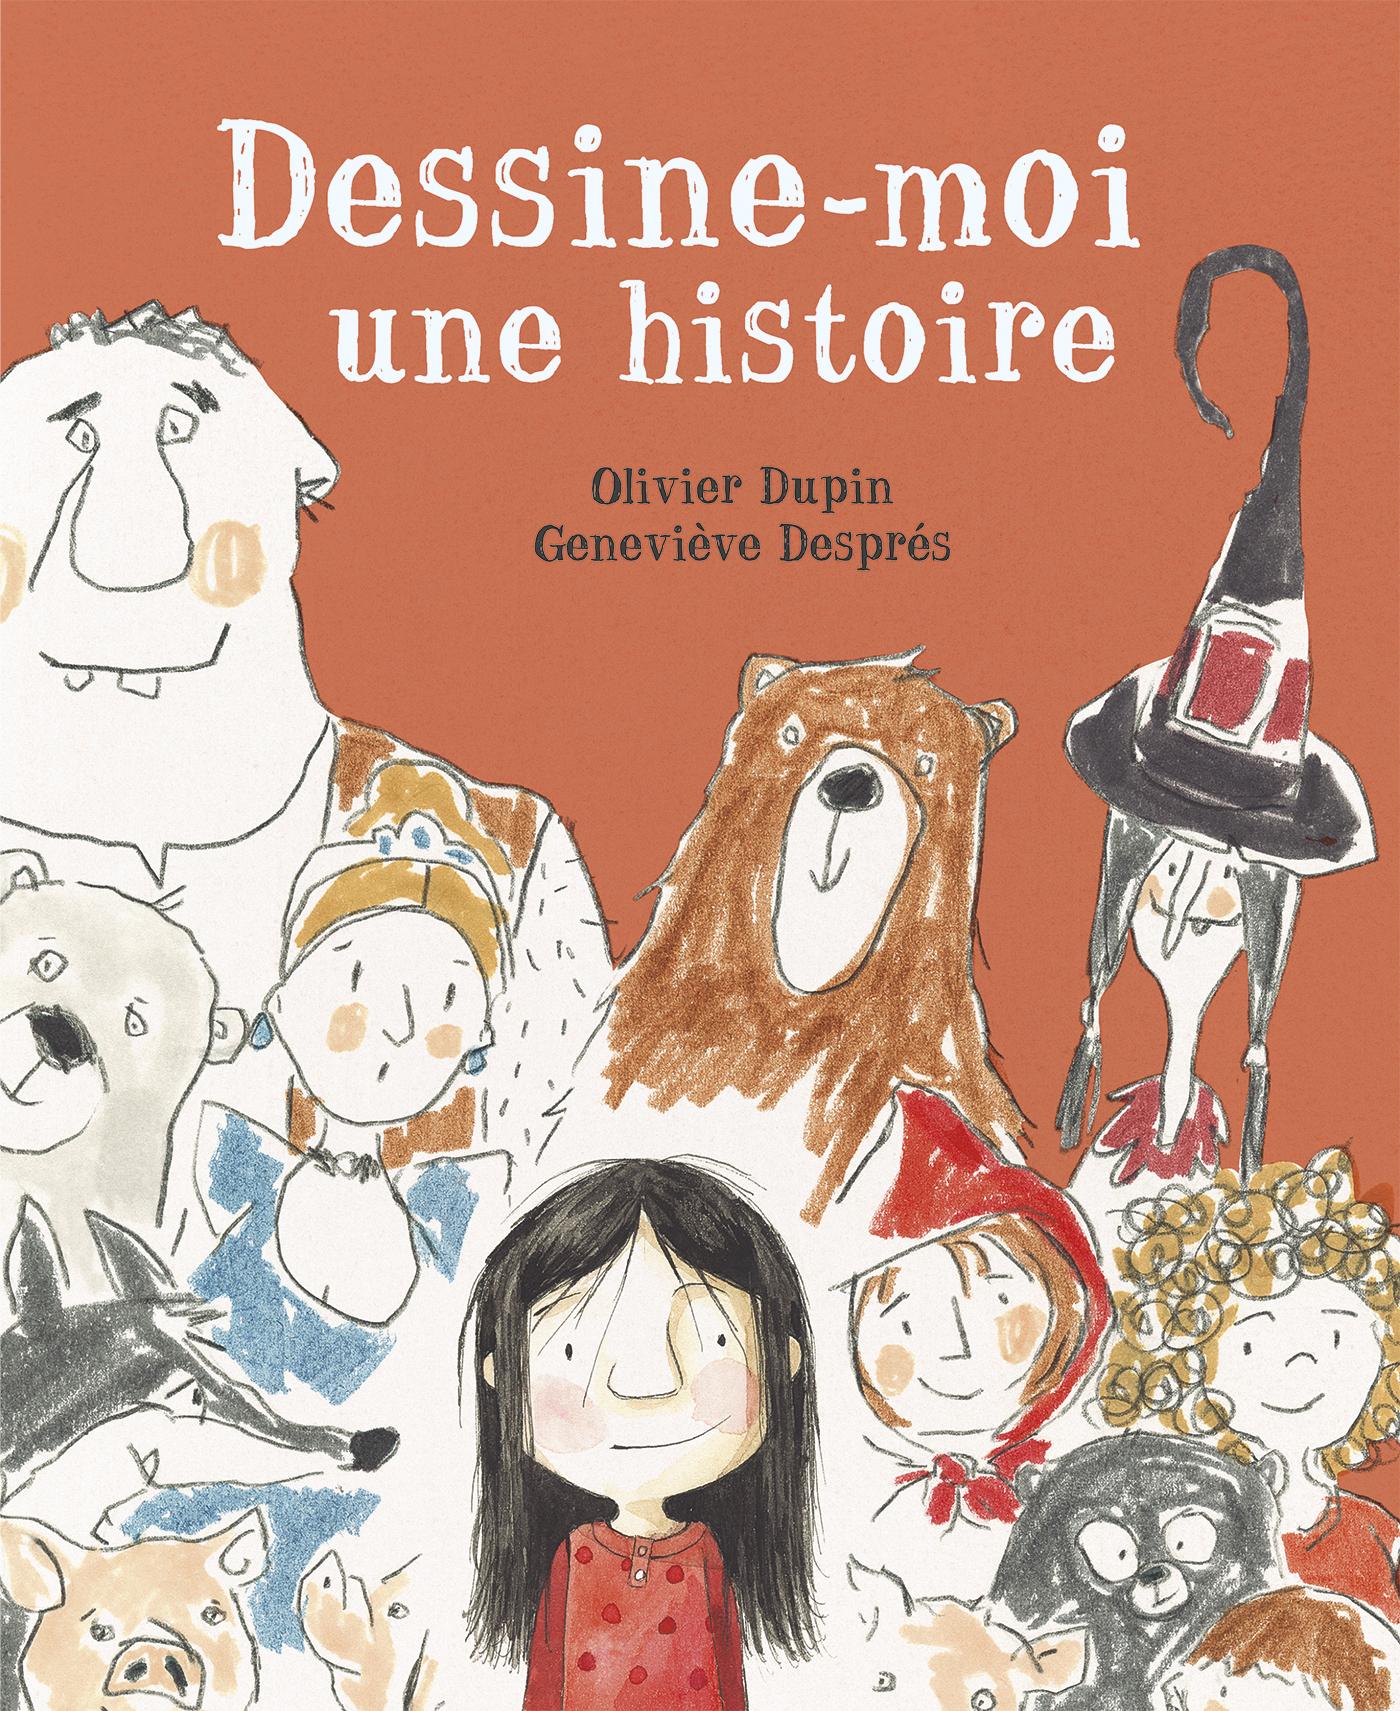 DESSINE-MOI UNE HISTOIRE